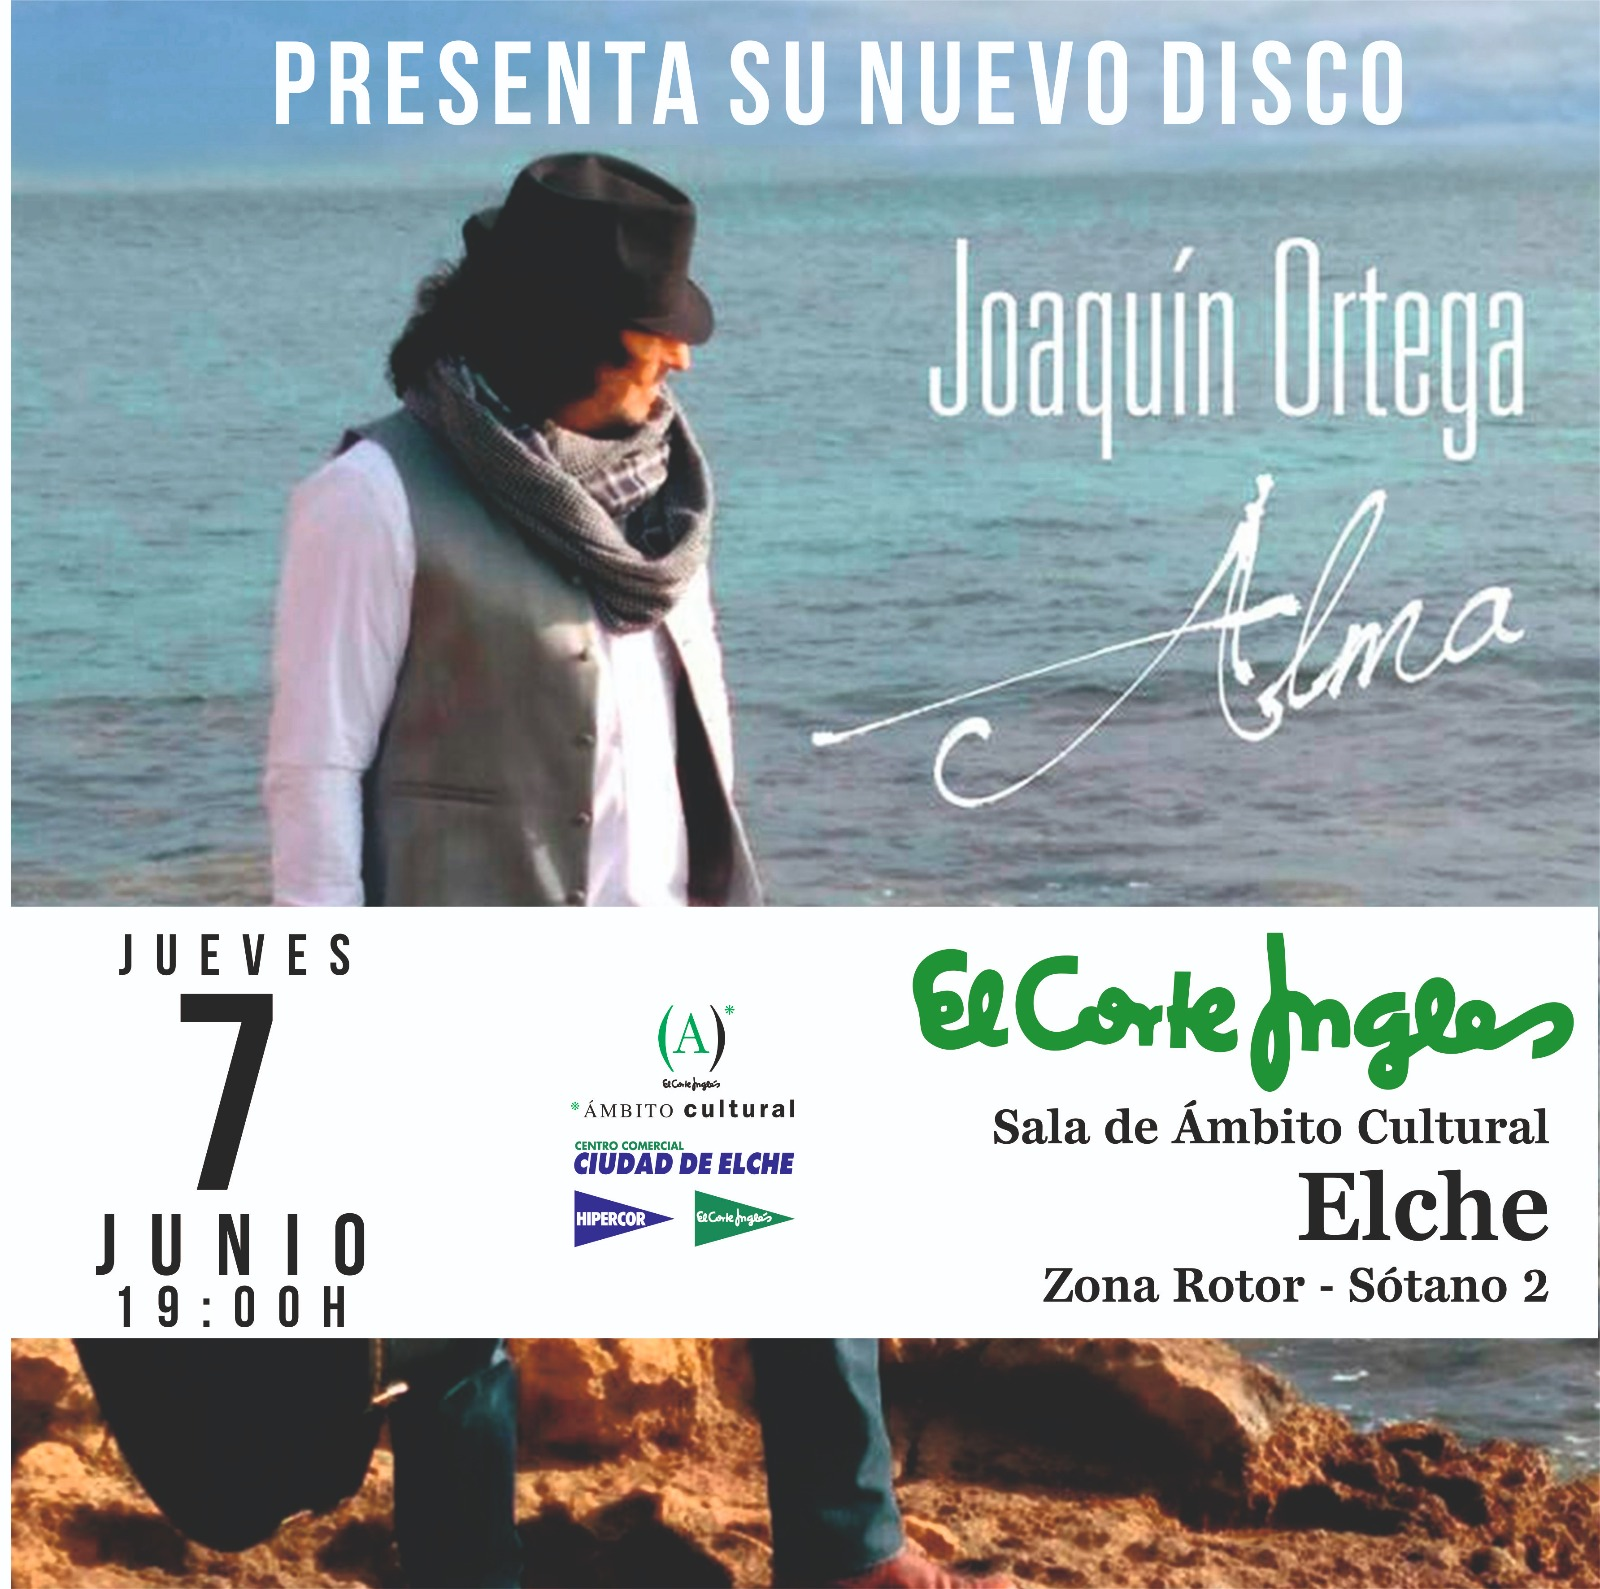 PRESENTACION DISCO JOAQUIN ORTEGA ELCHE